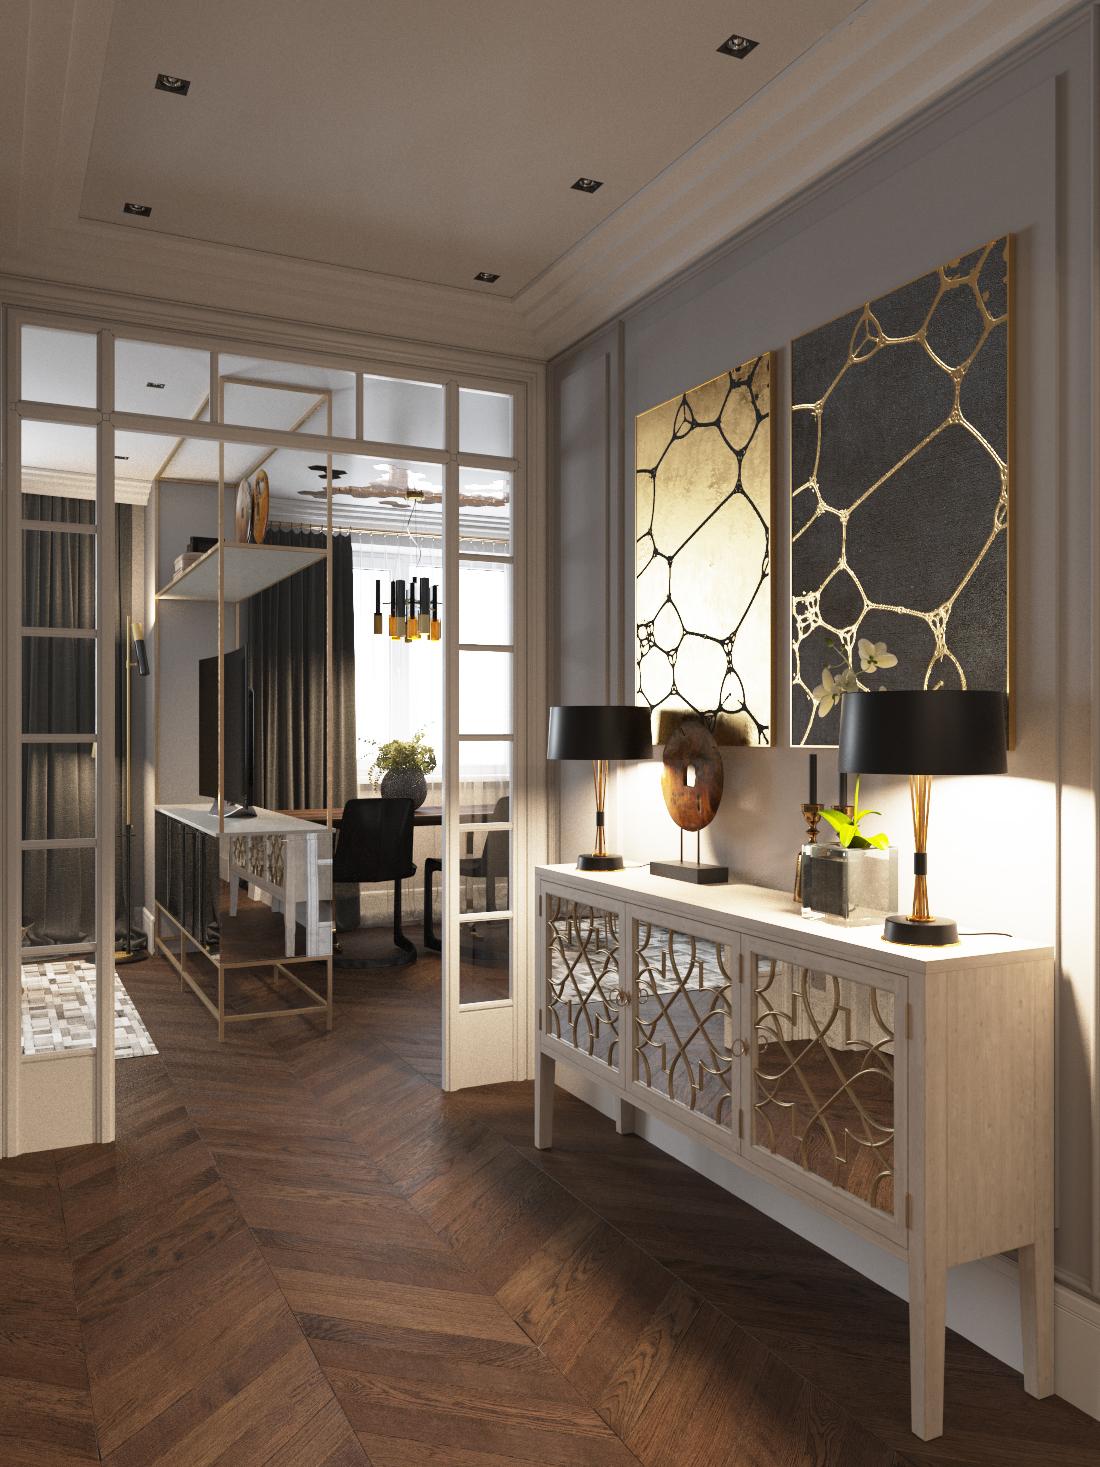 shmidt-6 ар-деко Проект интерьера в стиле ар-деко - Shmidt Studio, Беларусь shmidt 6